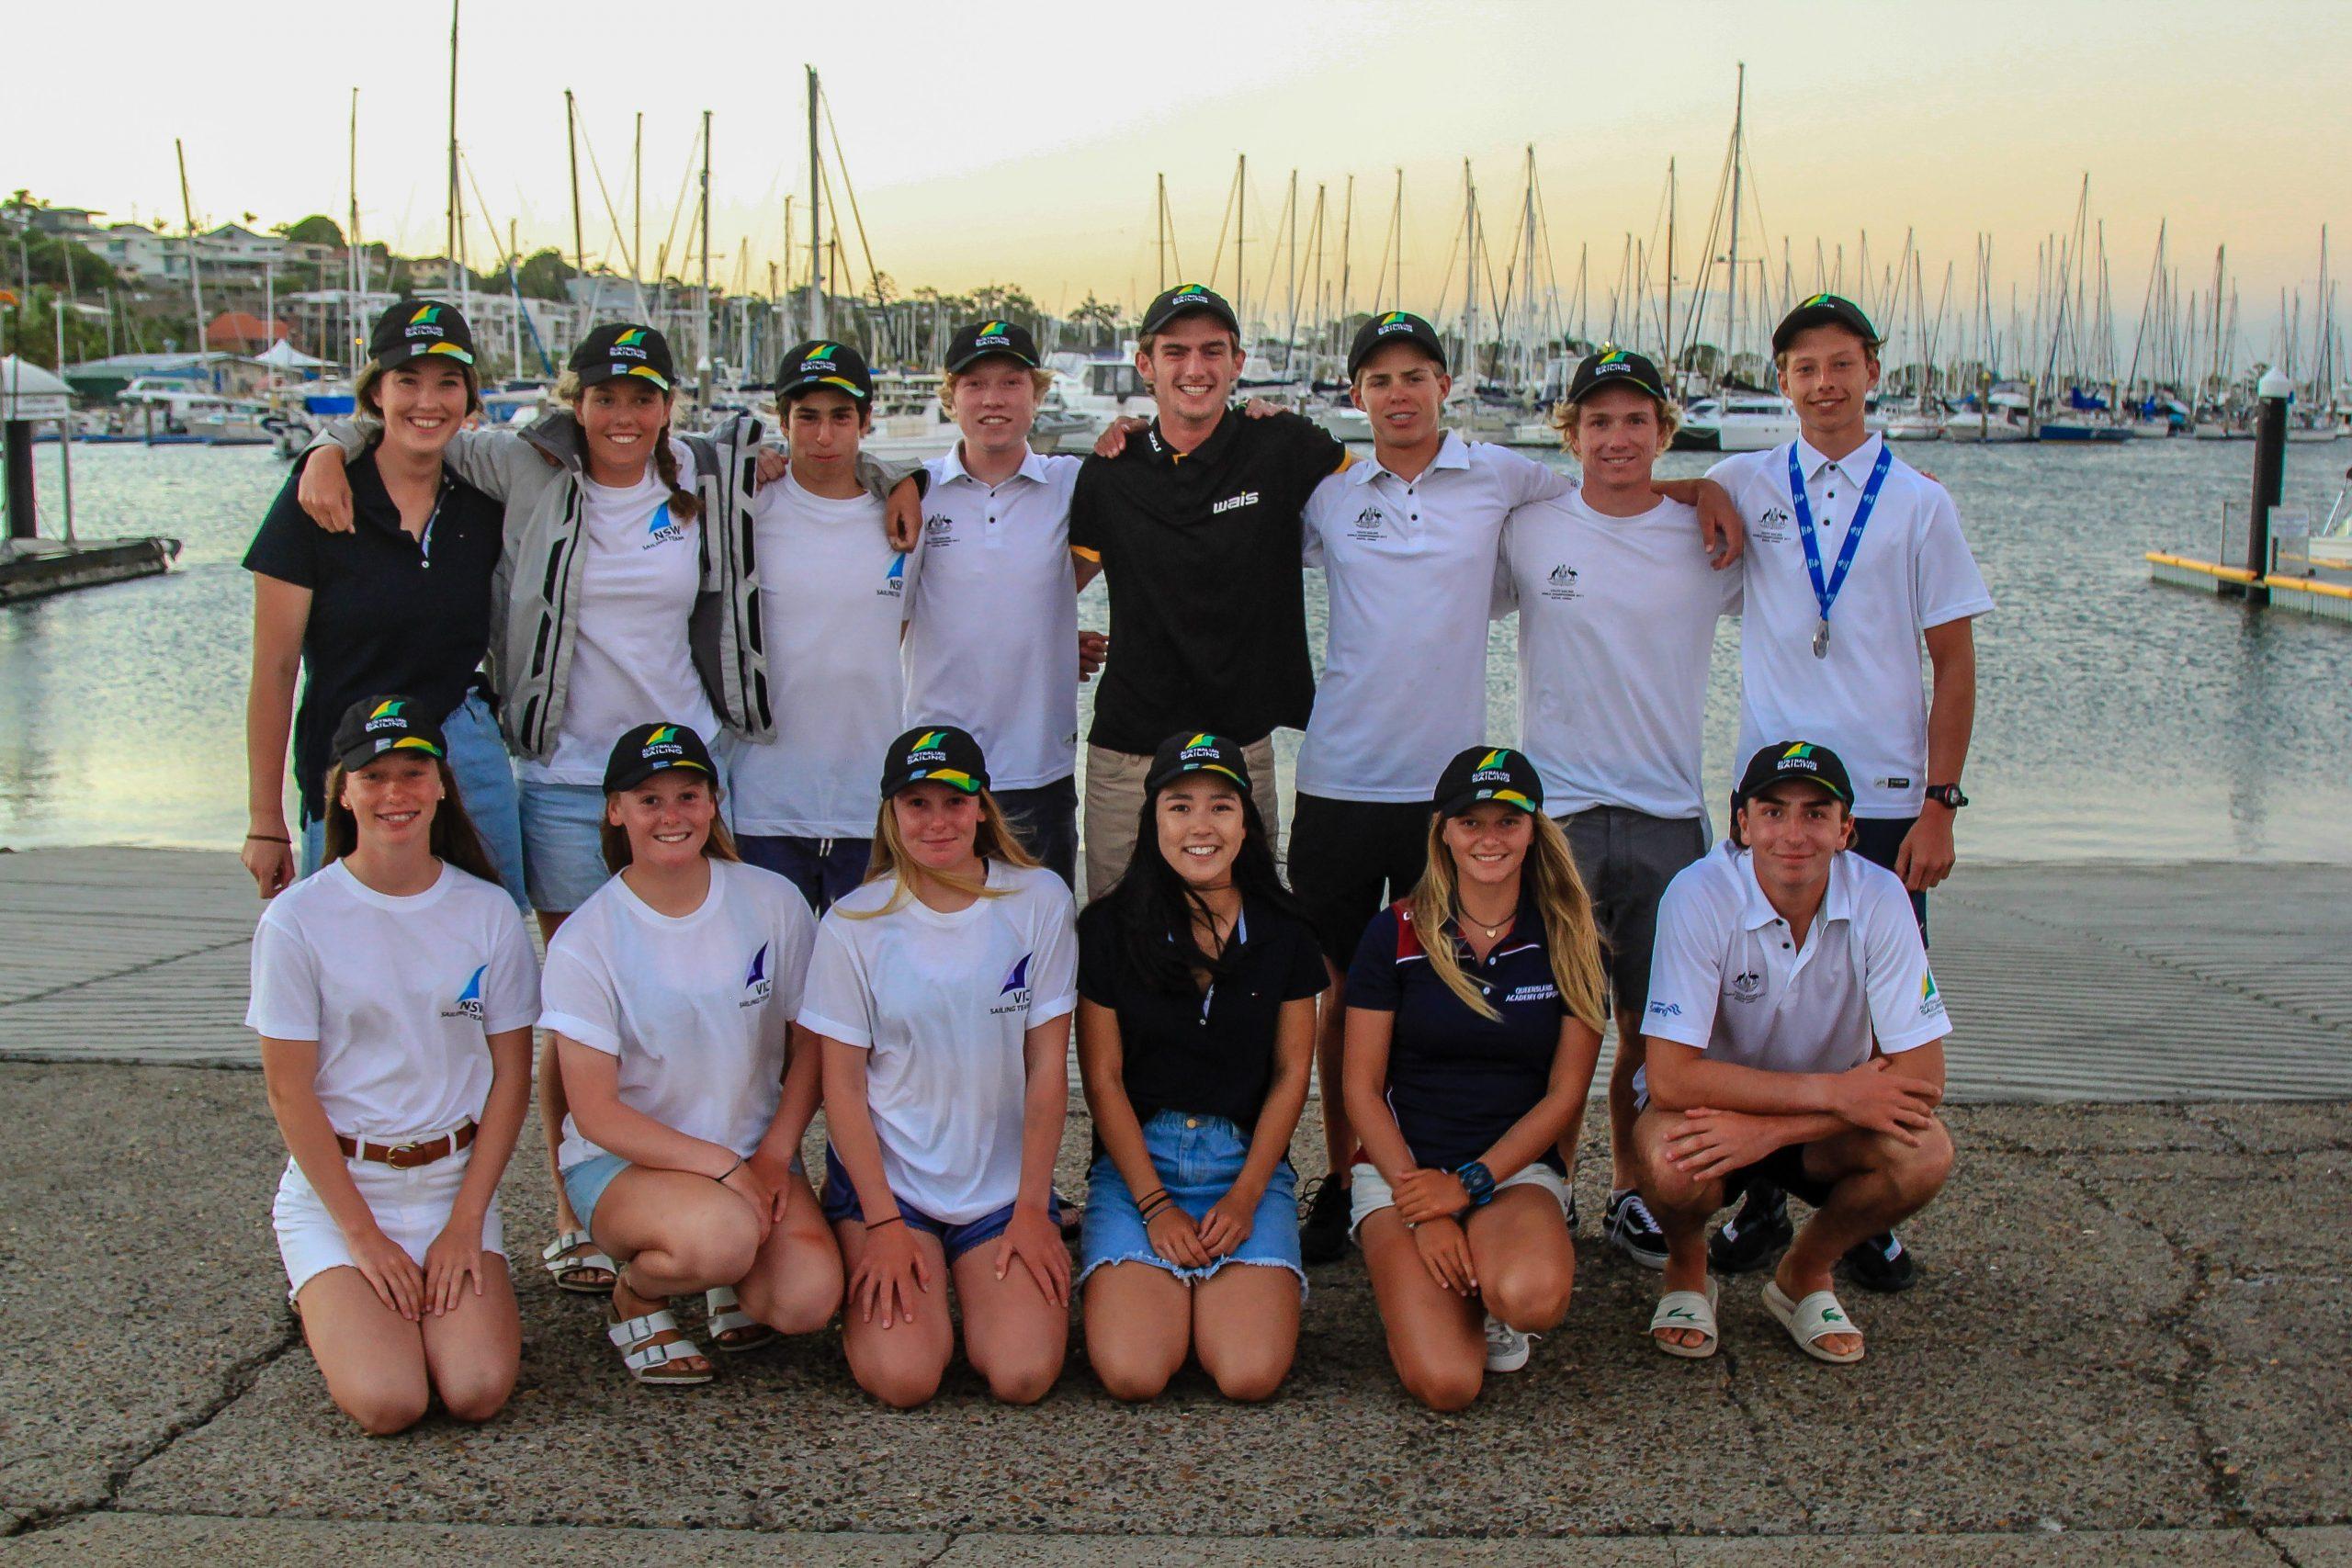 2018 Australian Youth Team. Photo Australian Sailing.